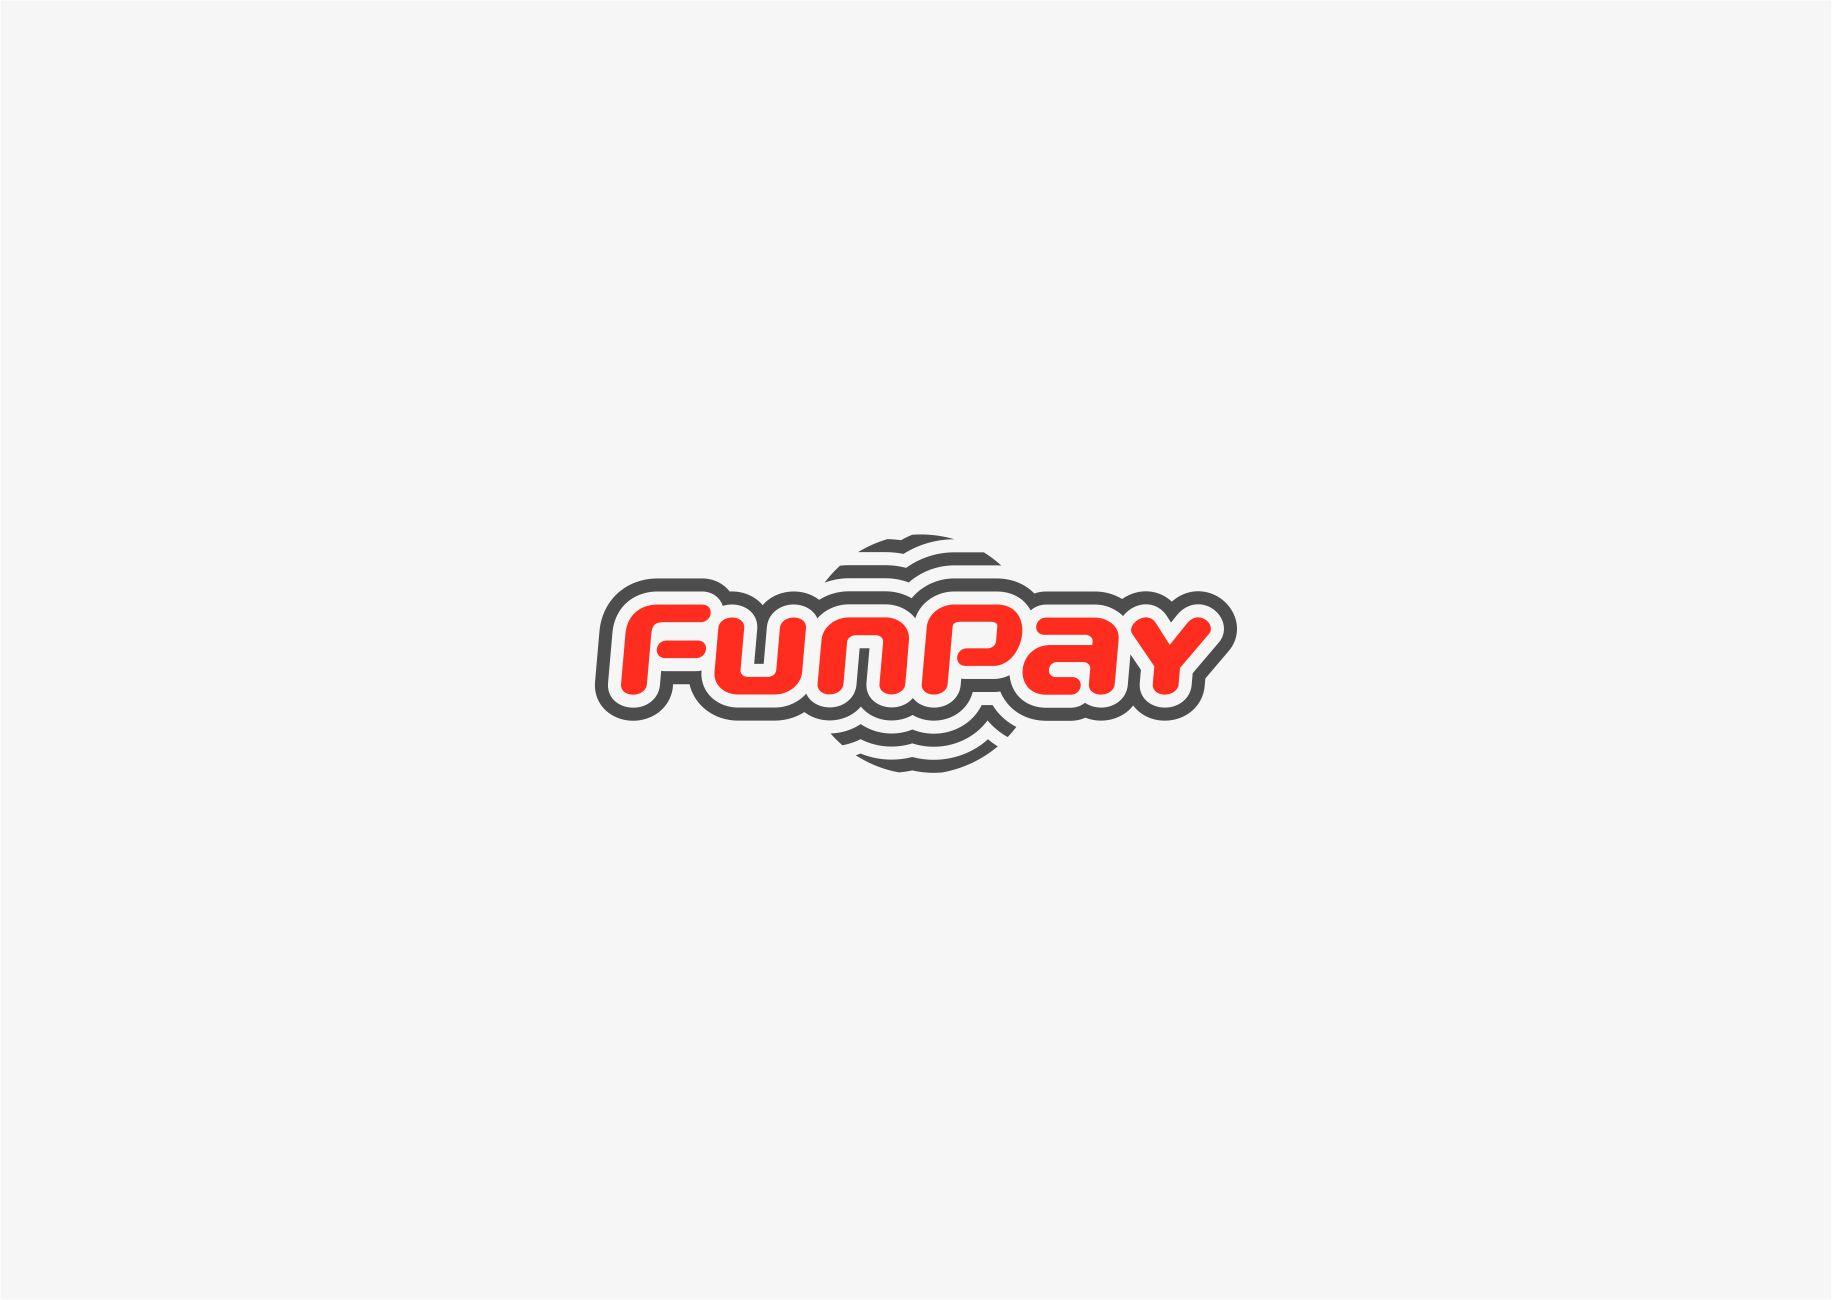 Логотип для FunPay.ru фото f_2825991a9d768c64.jpg